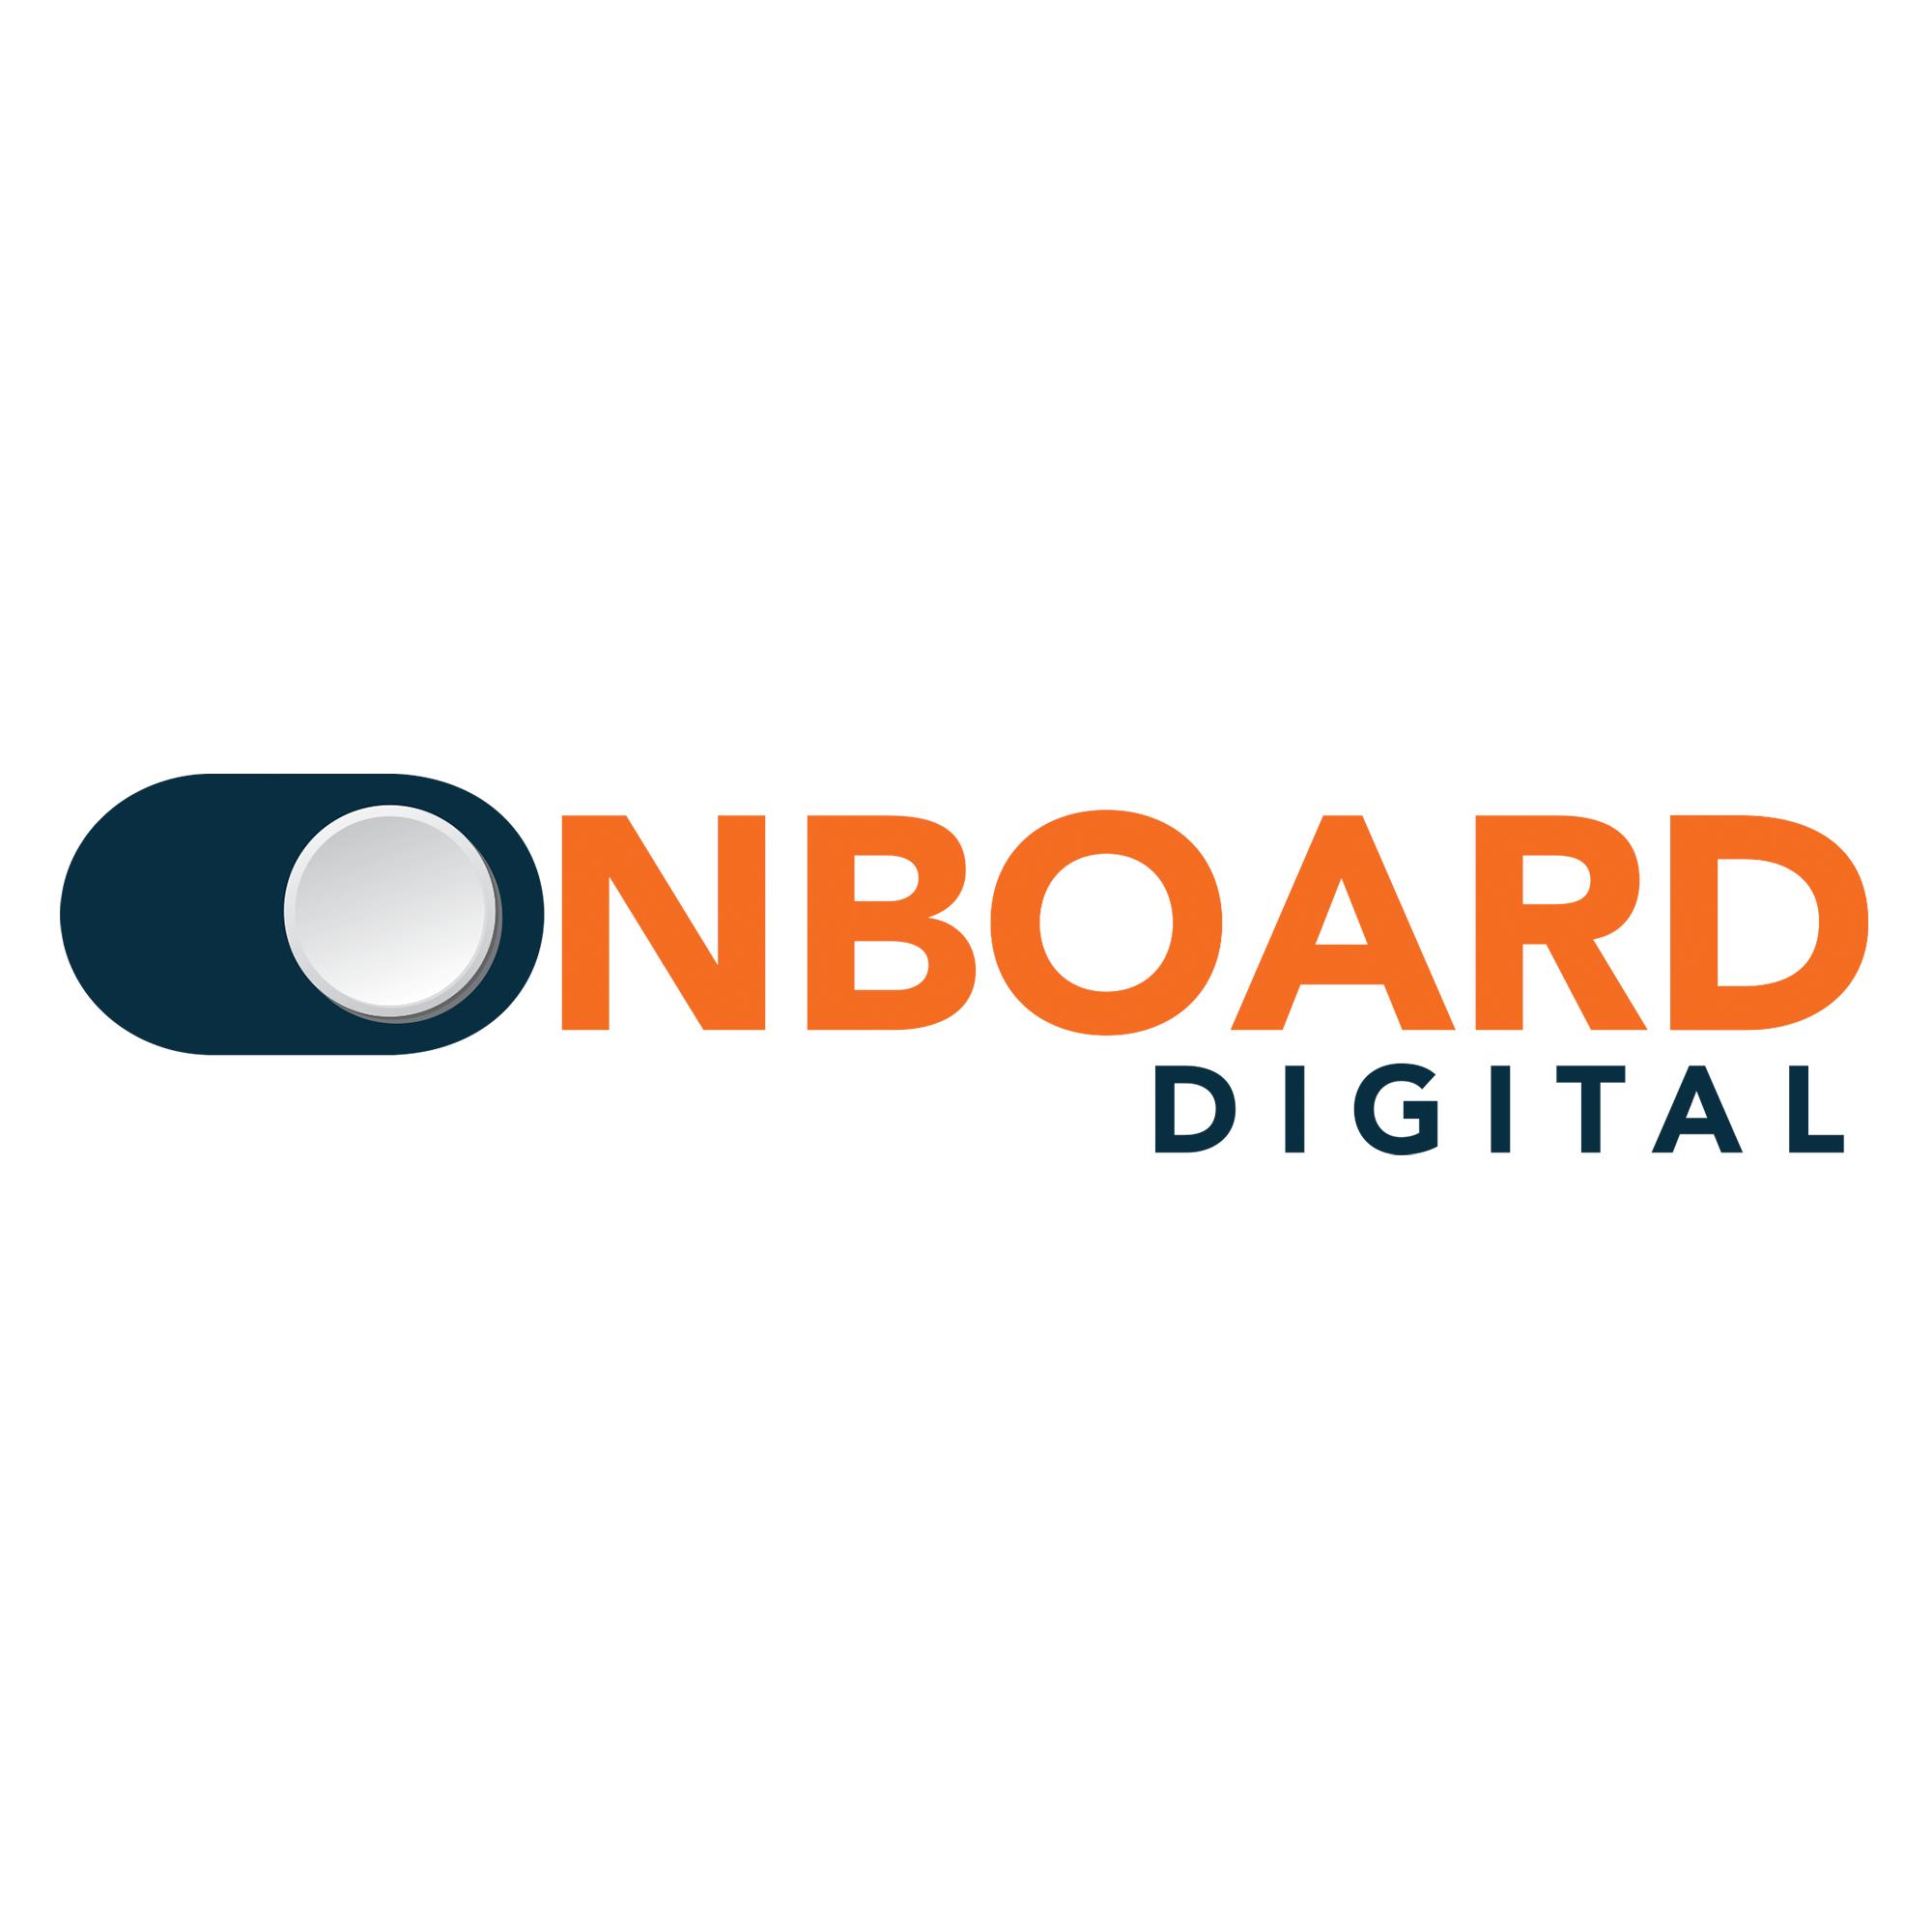 ONBOARDdigital